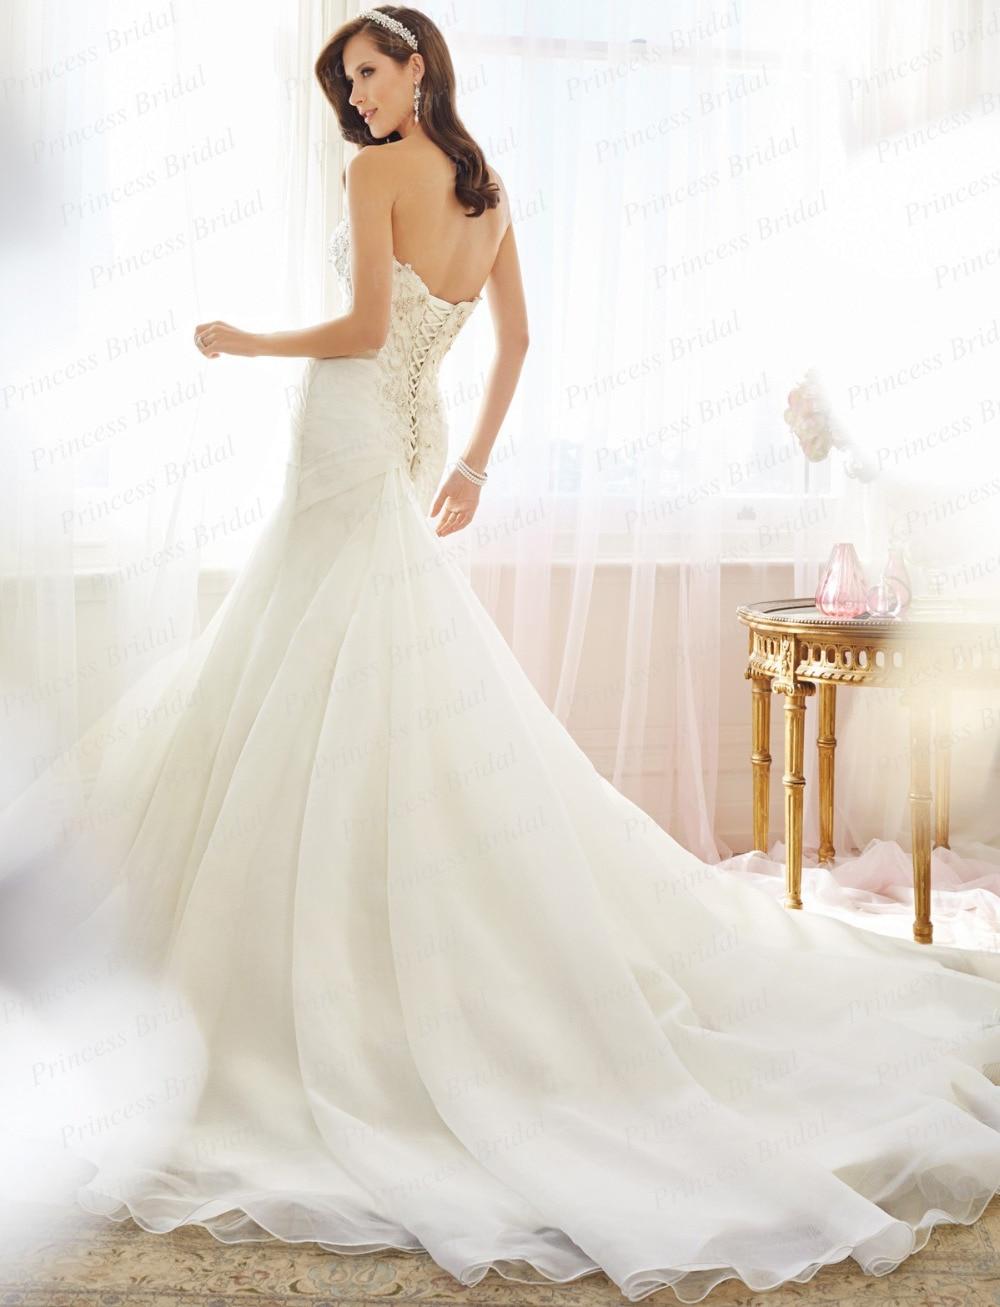 Corset styles wedding dresses